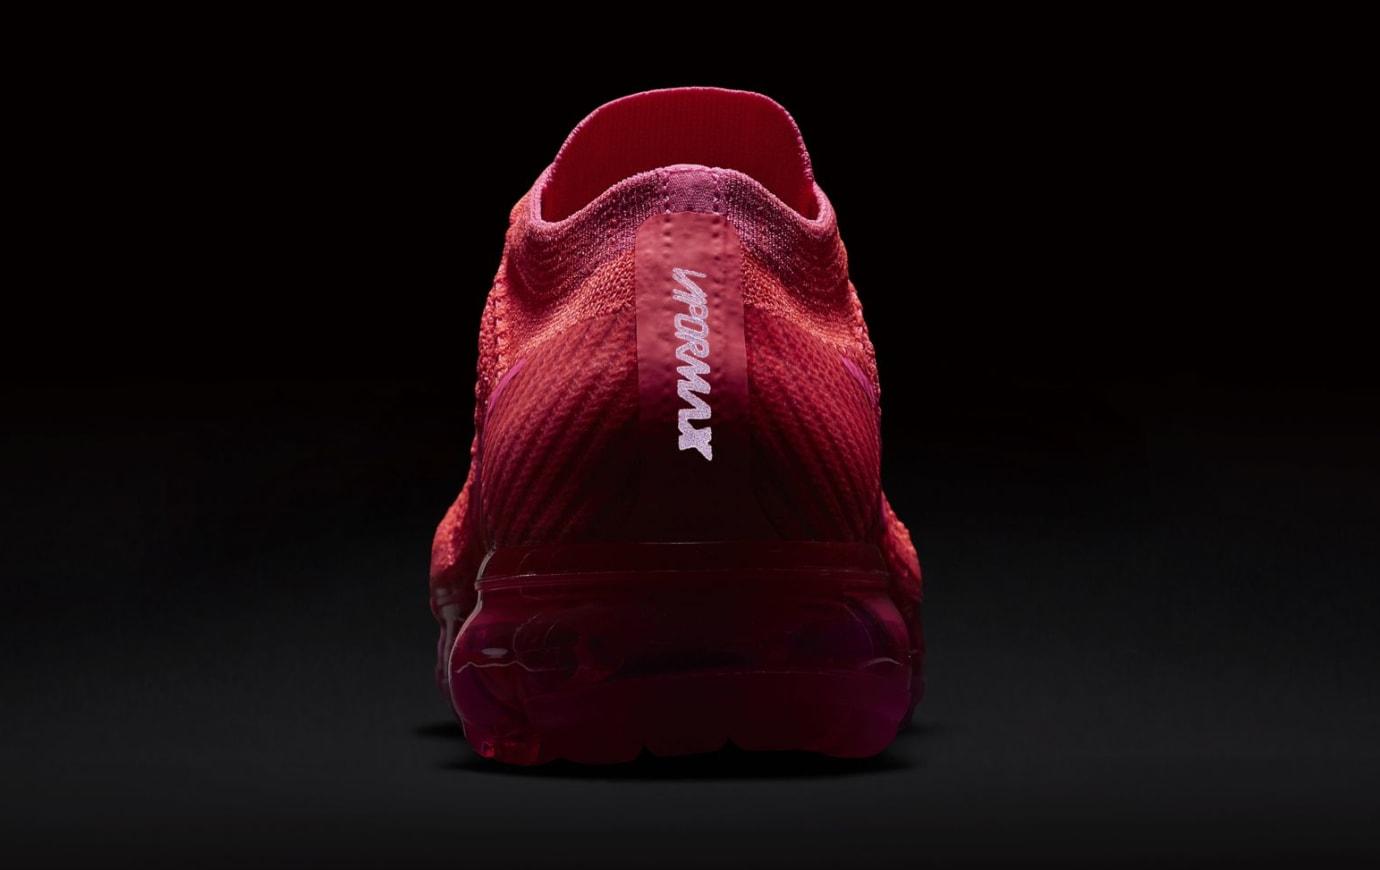 Nike Air Vapormax WMNS Bright Crimson/Hot Pink (3M)